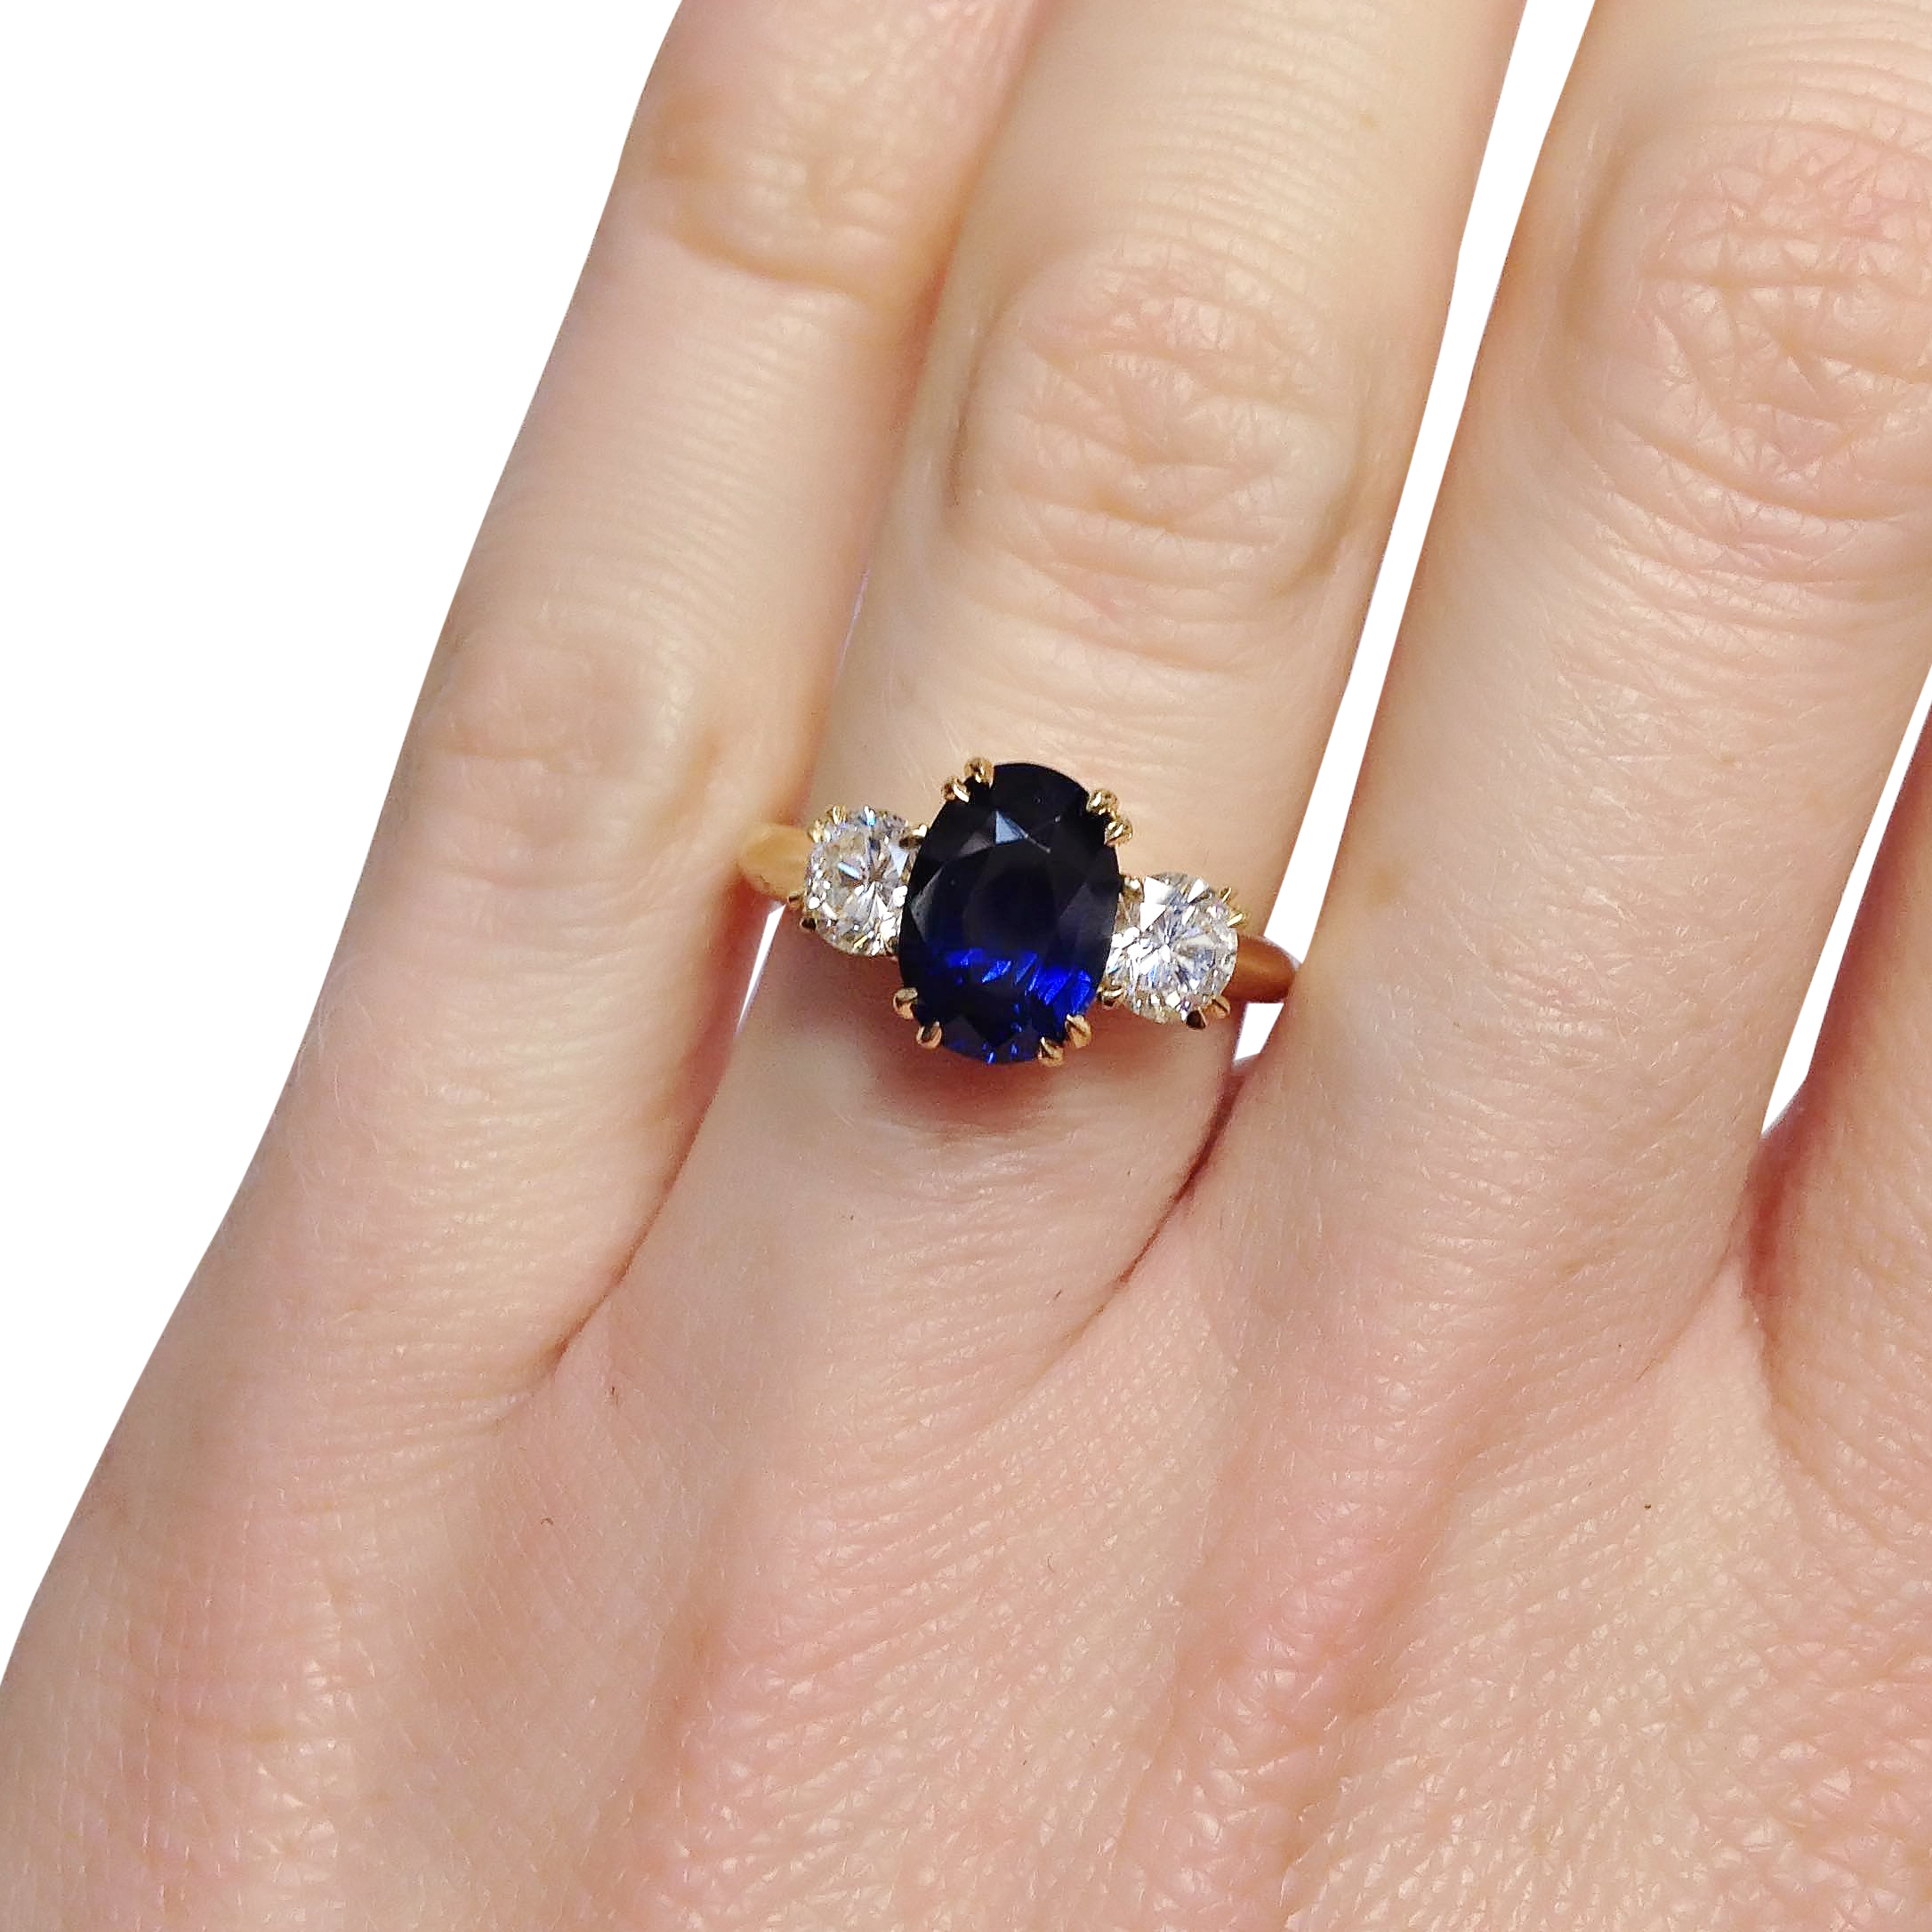 Sapphire-and-diamond-three-stone-ring-in-yellow-gold.jpg